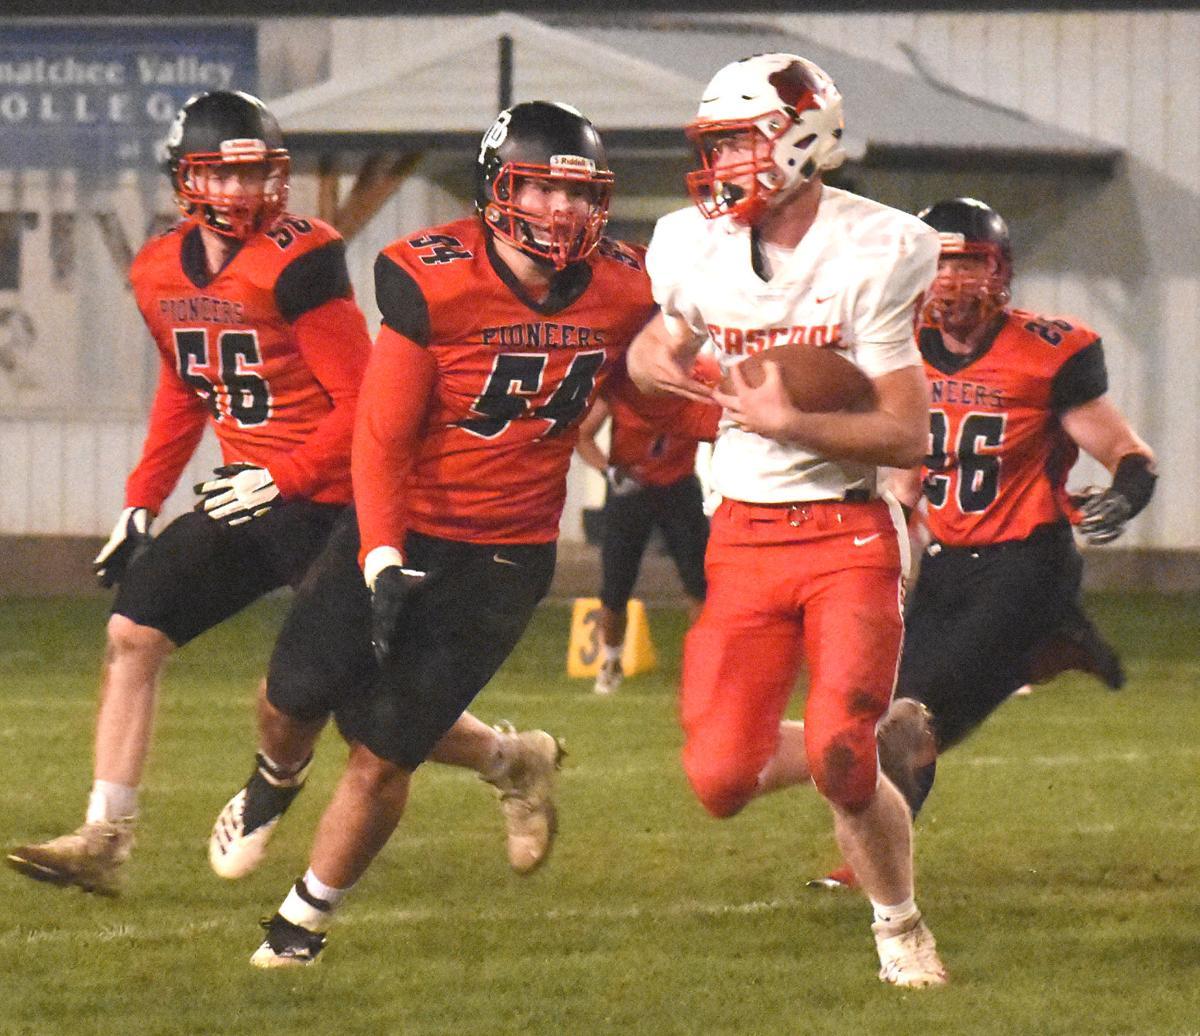 Tanner Sackman tackle